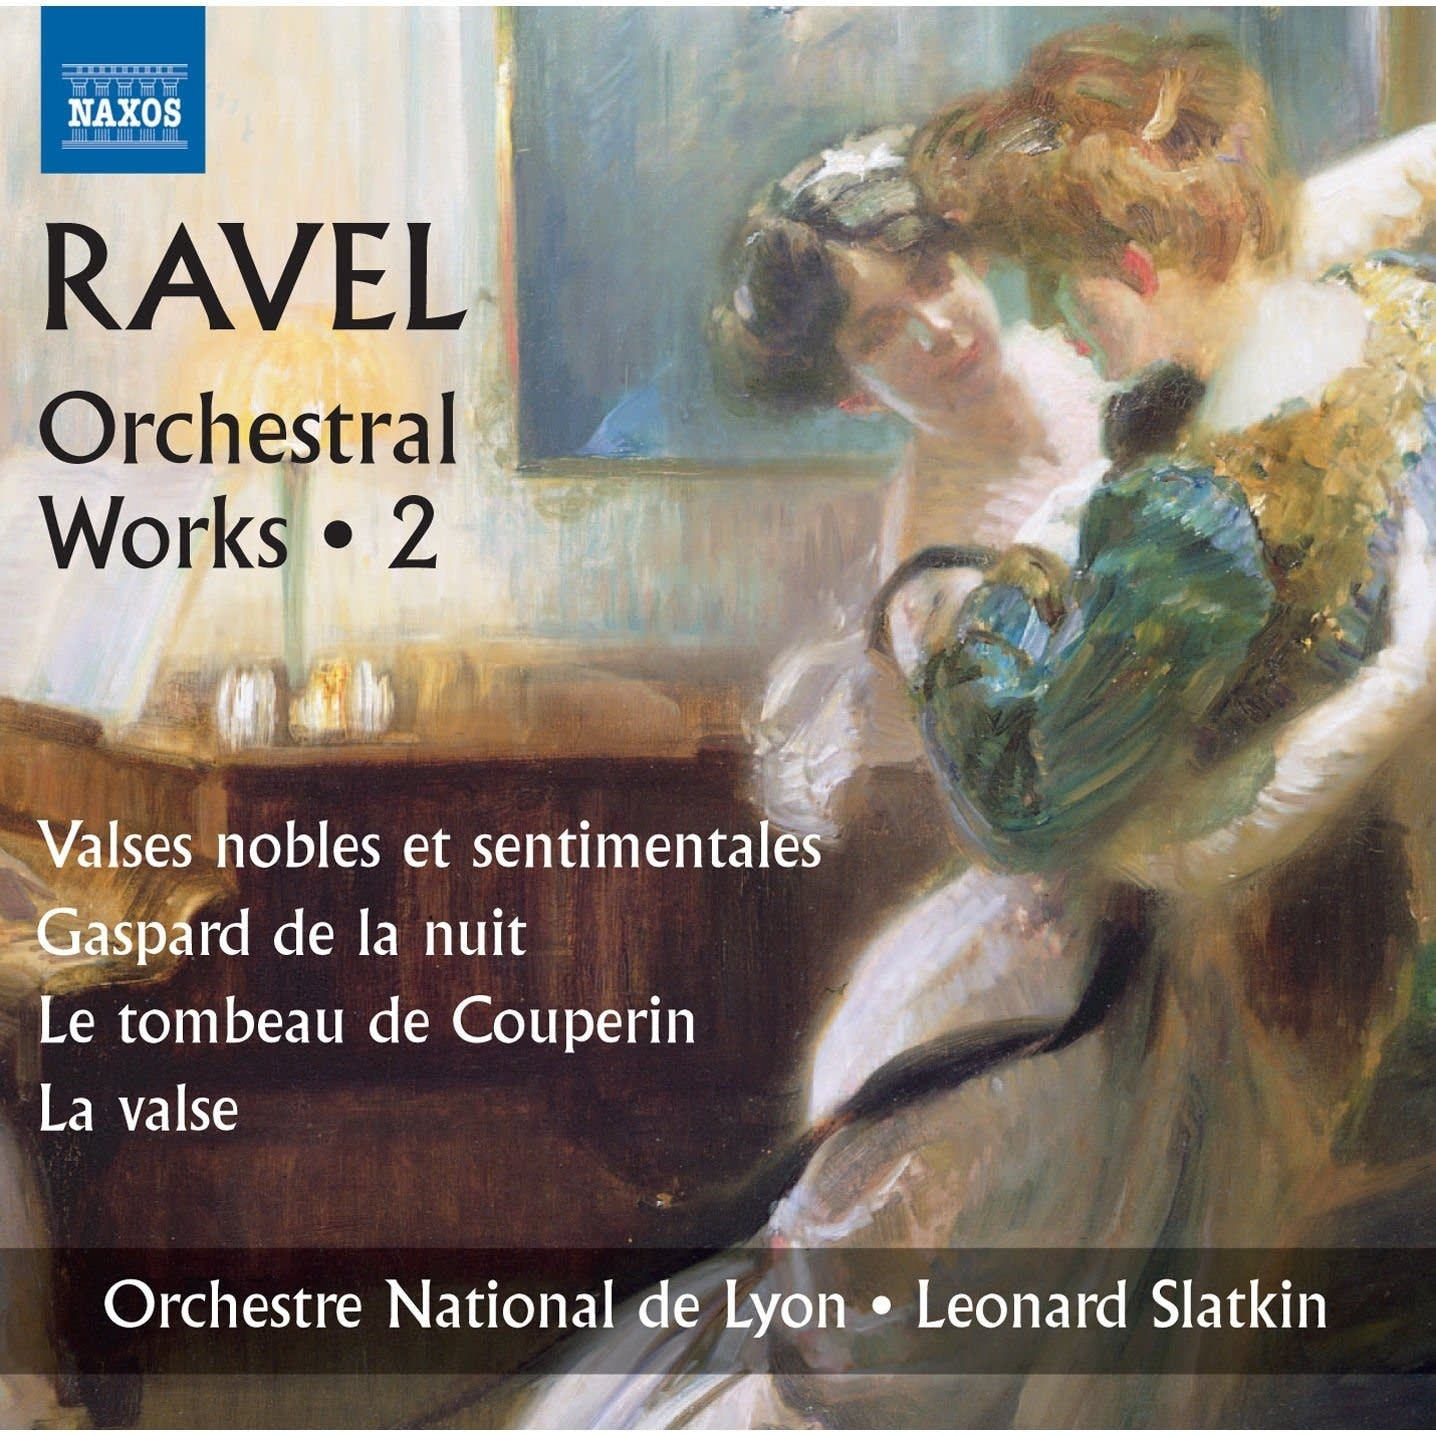 Maurice Ravel - Le Tombeau de Couperin: Rigaudon